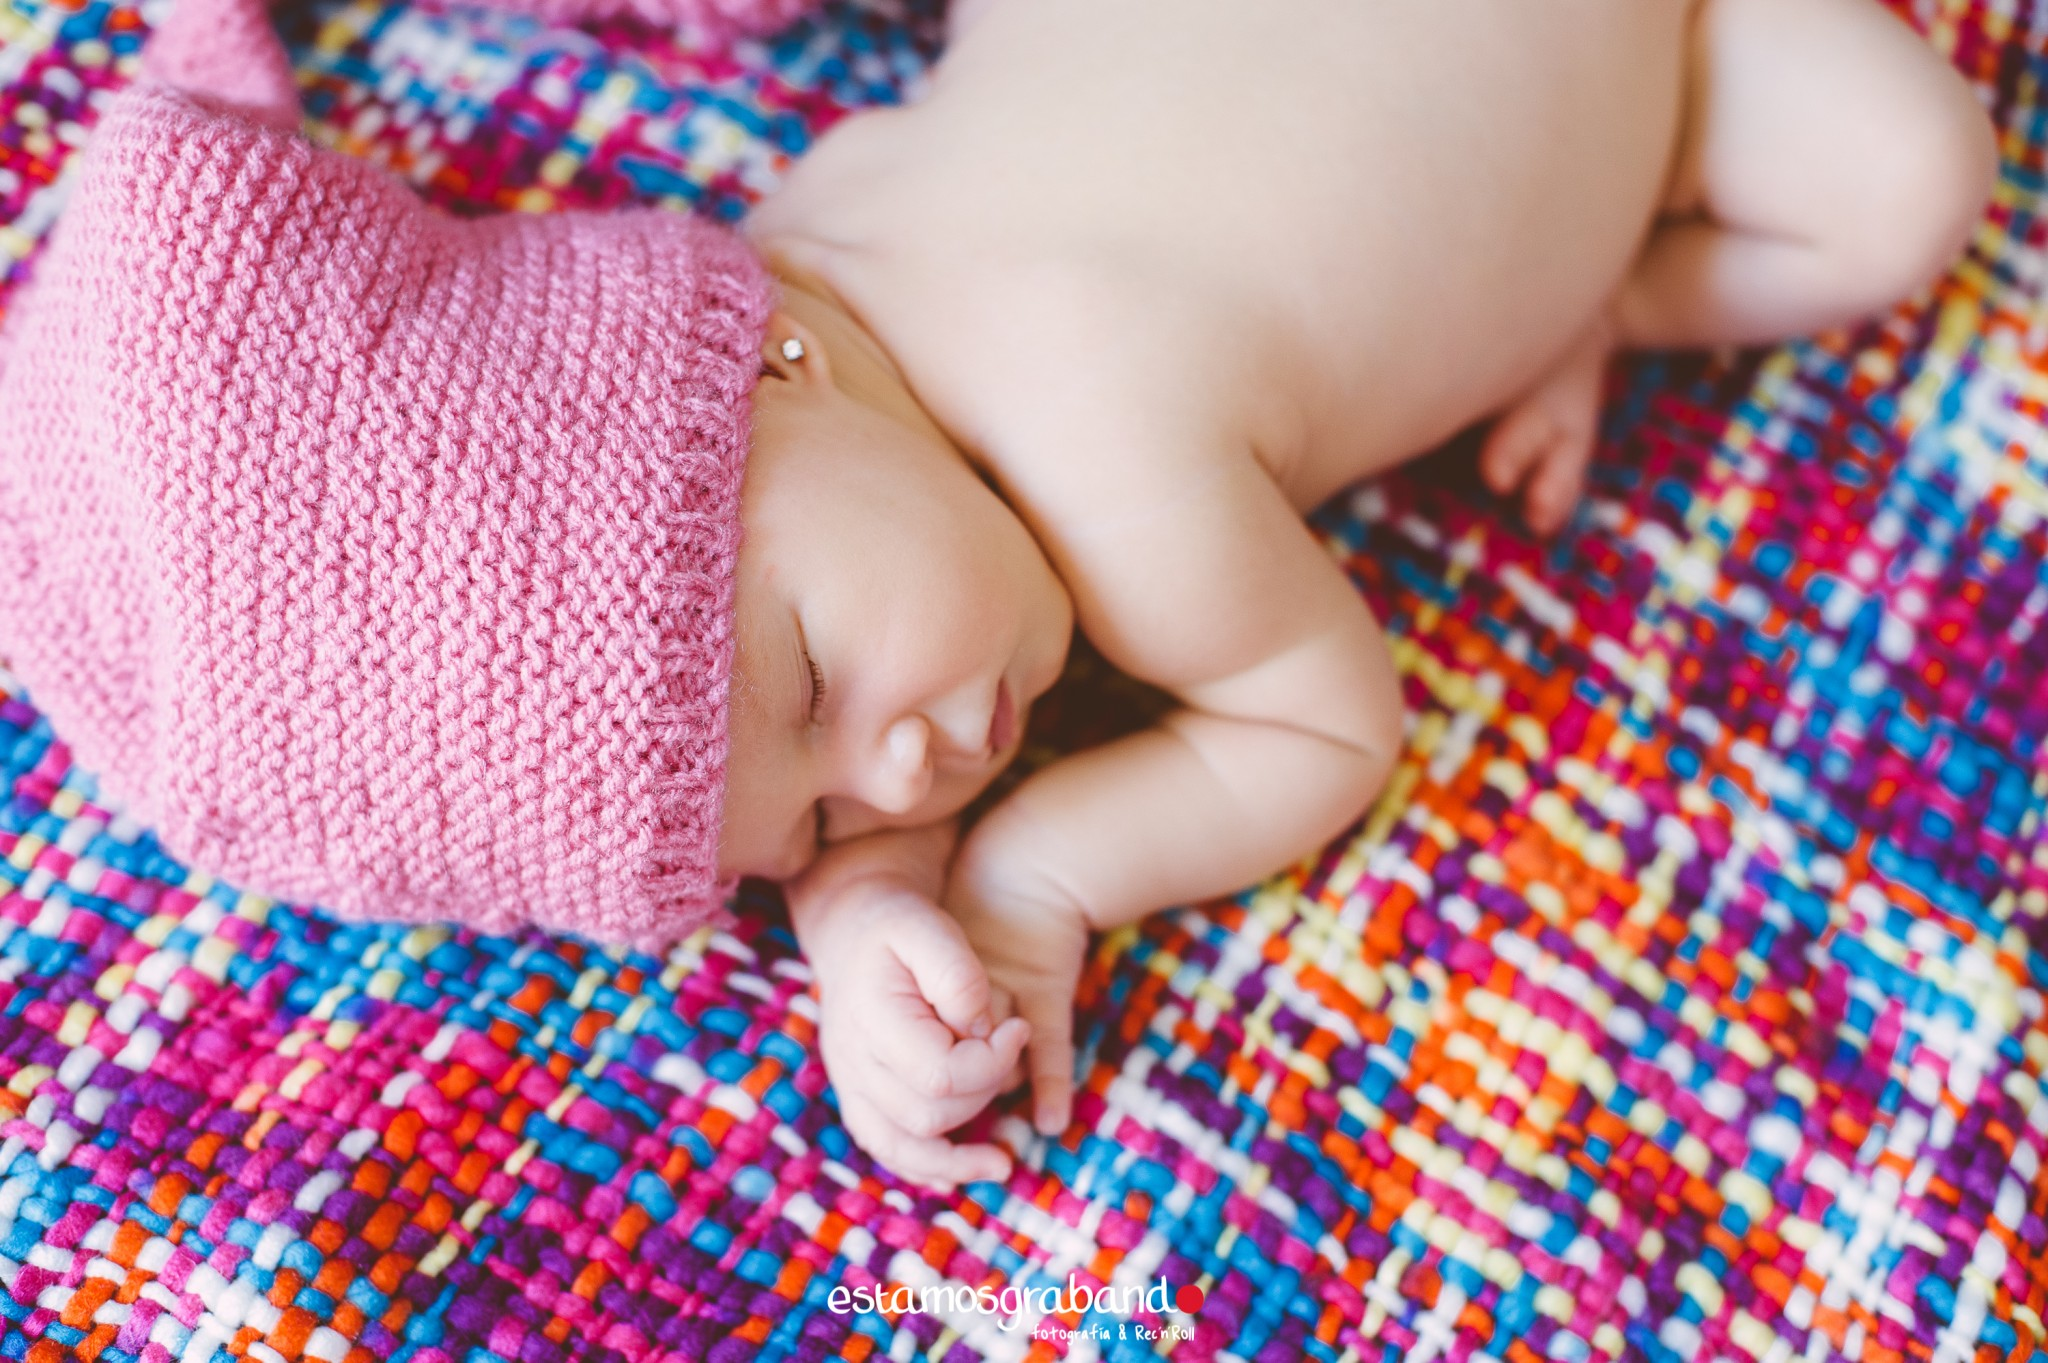 foto-bebe-fotografia-new-born-recien-nacidos-foto-familia-sesion-zahira-18 Zahira, The Baby - video boda cadiz